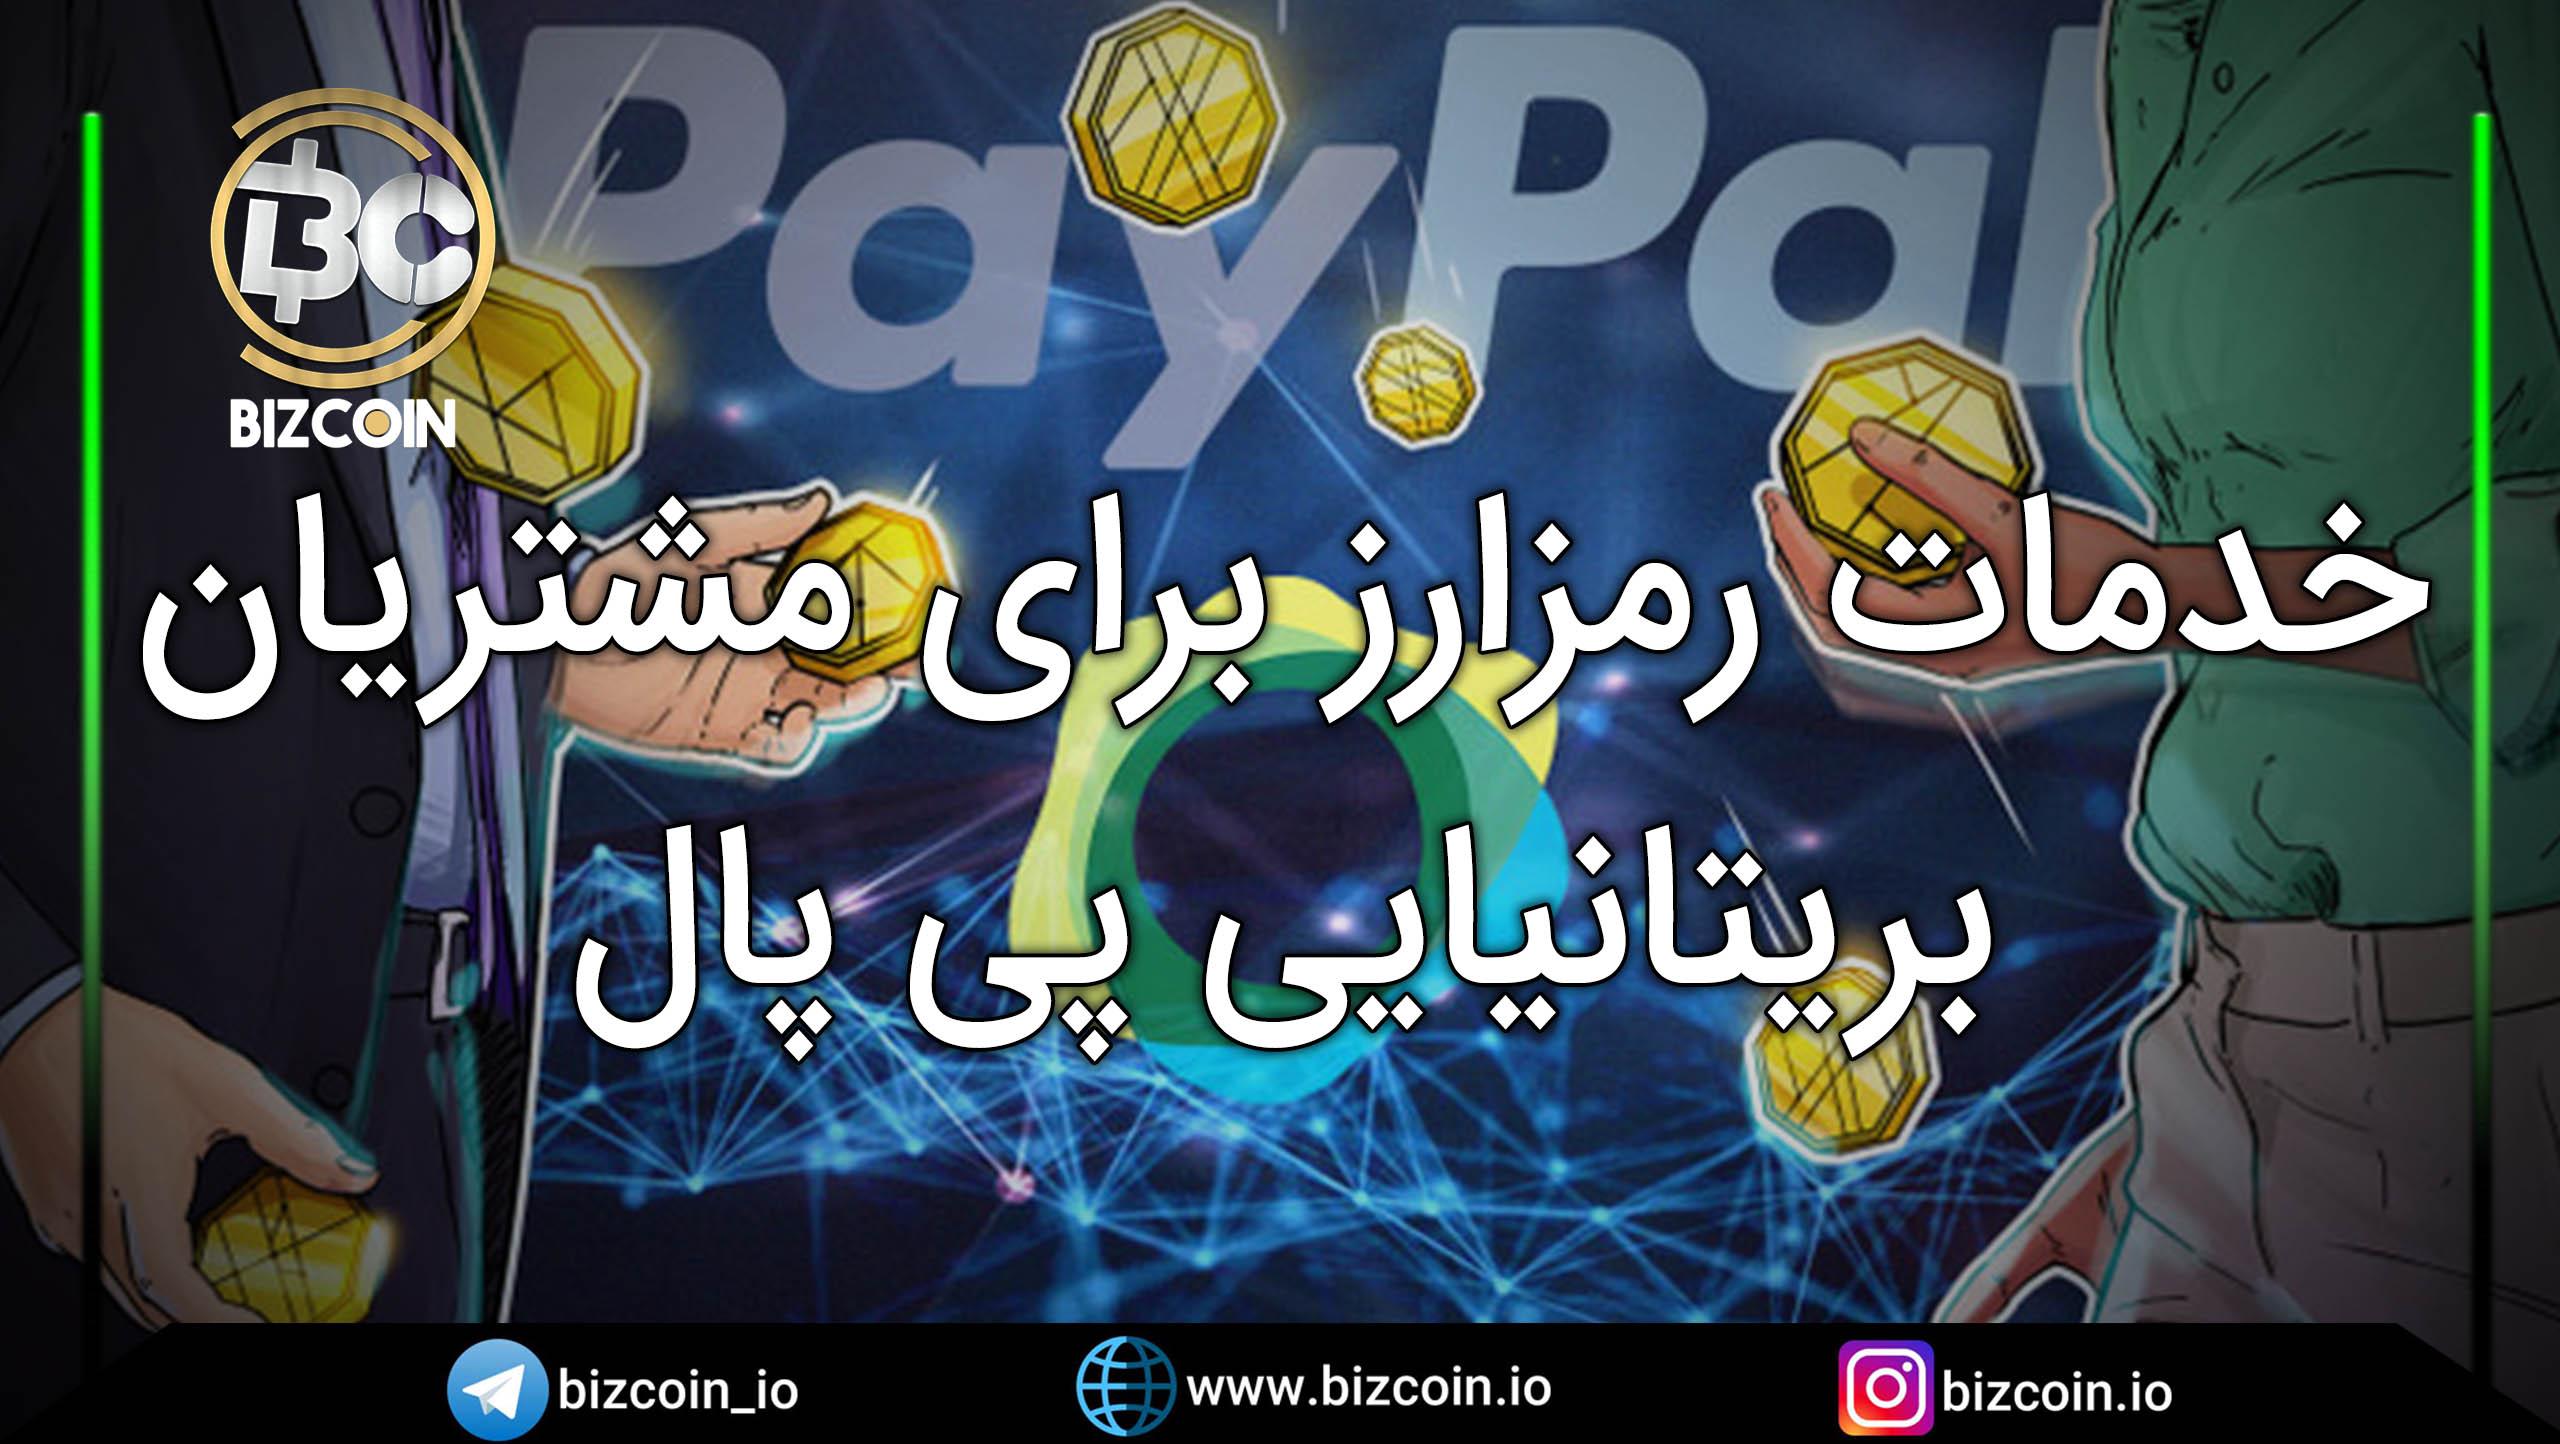 crypto services for PayPal UK customers خدمات رمزارز برای مشتریان بریتانیایی پی پال